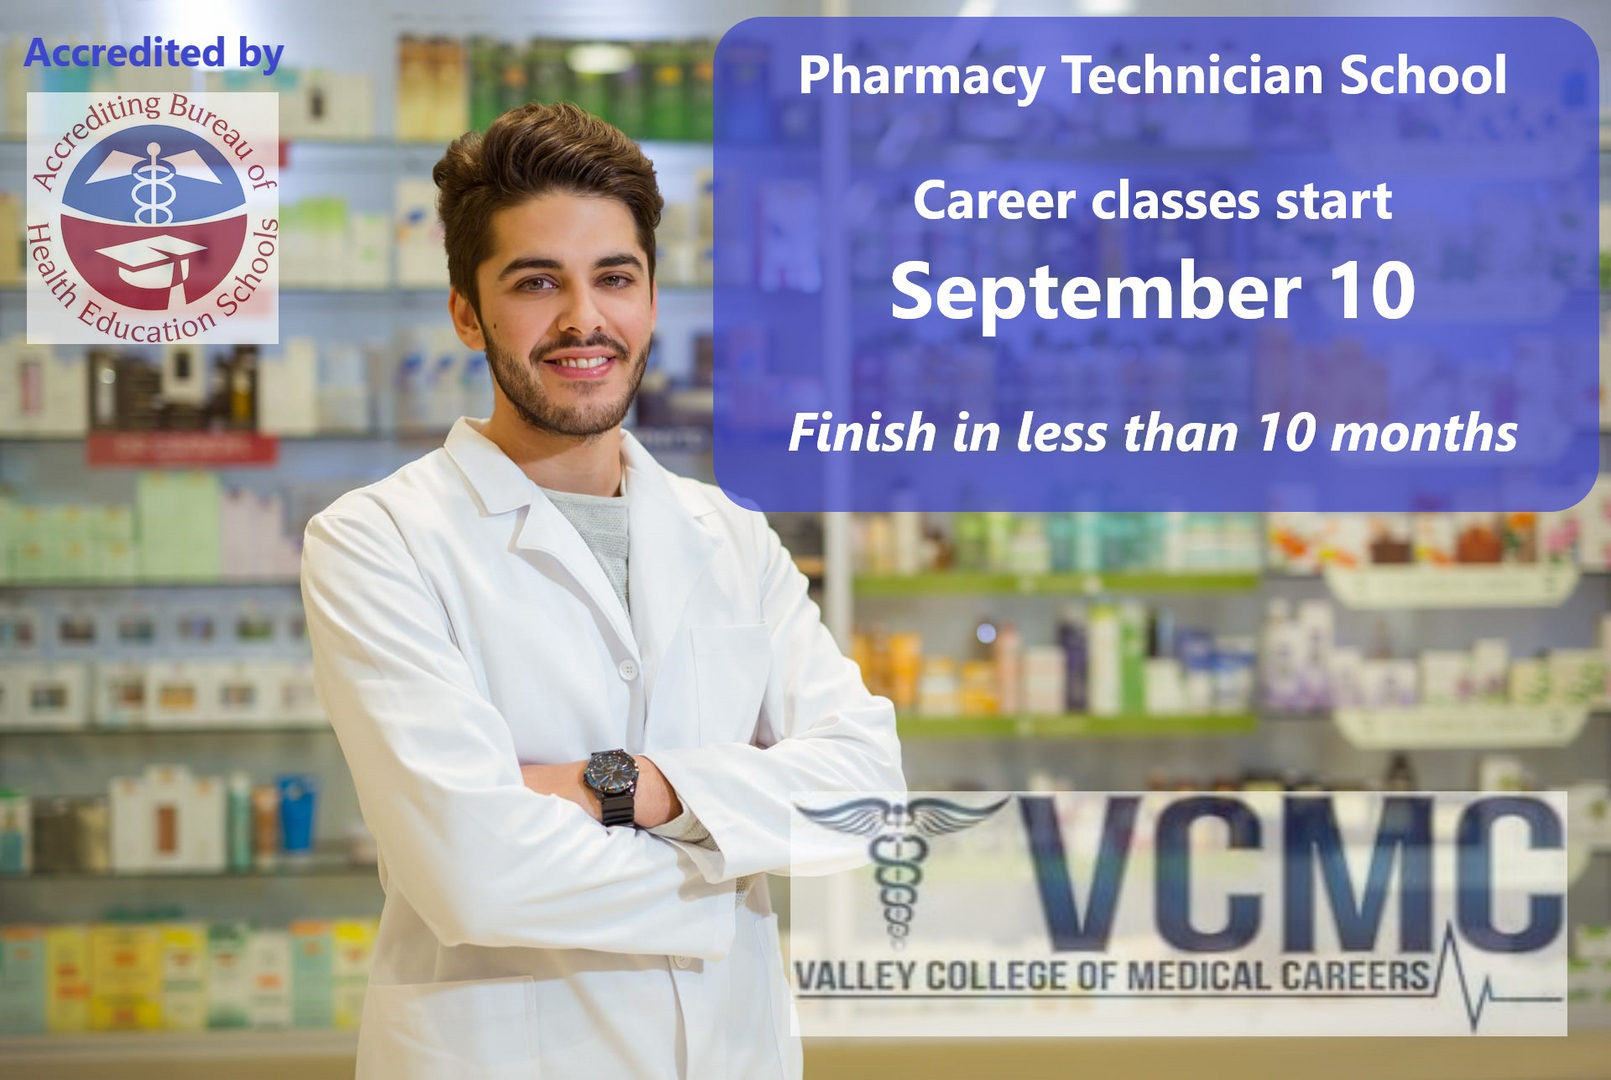 Medical Career Programs - Valley College of Medical Careers